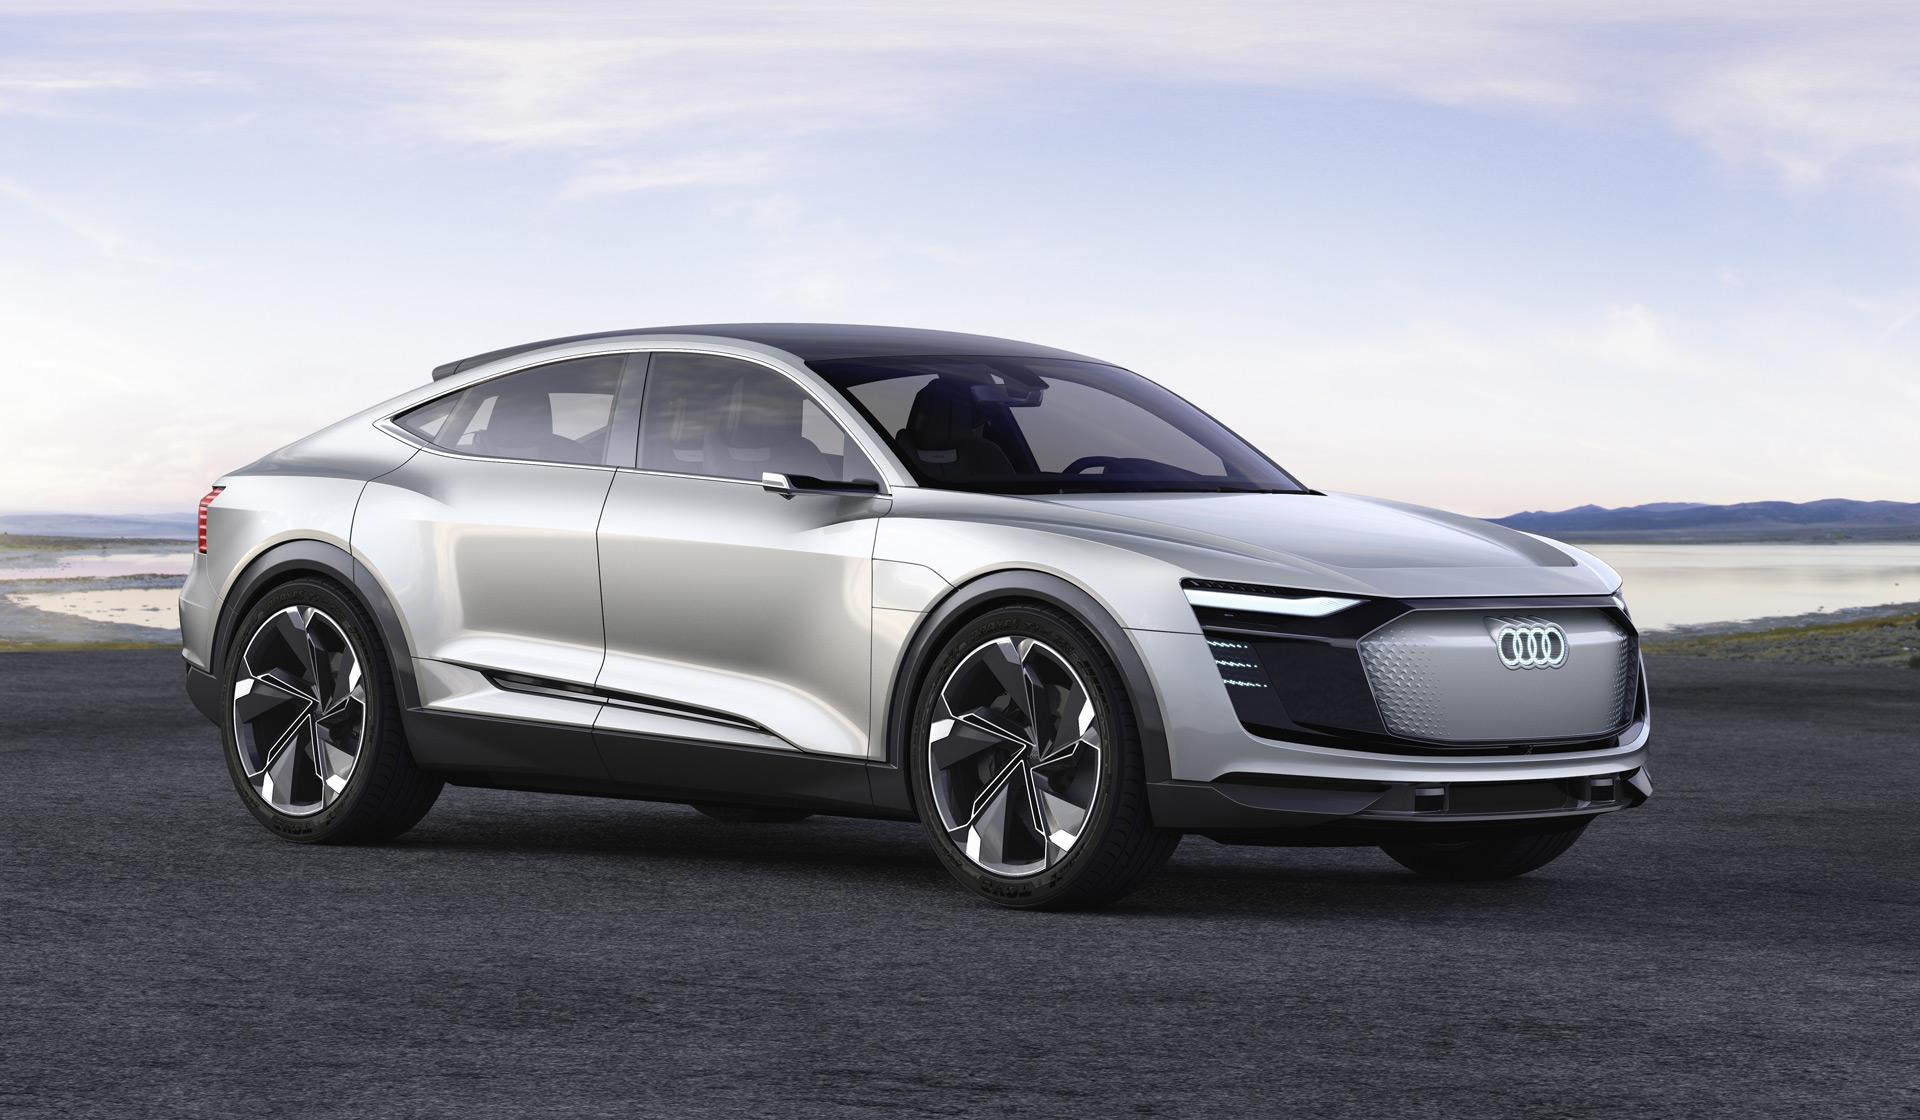 Hybrid Cars Audi Etron Sportback Second Electric Car Automaker Enter - Audi hybrid cars